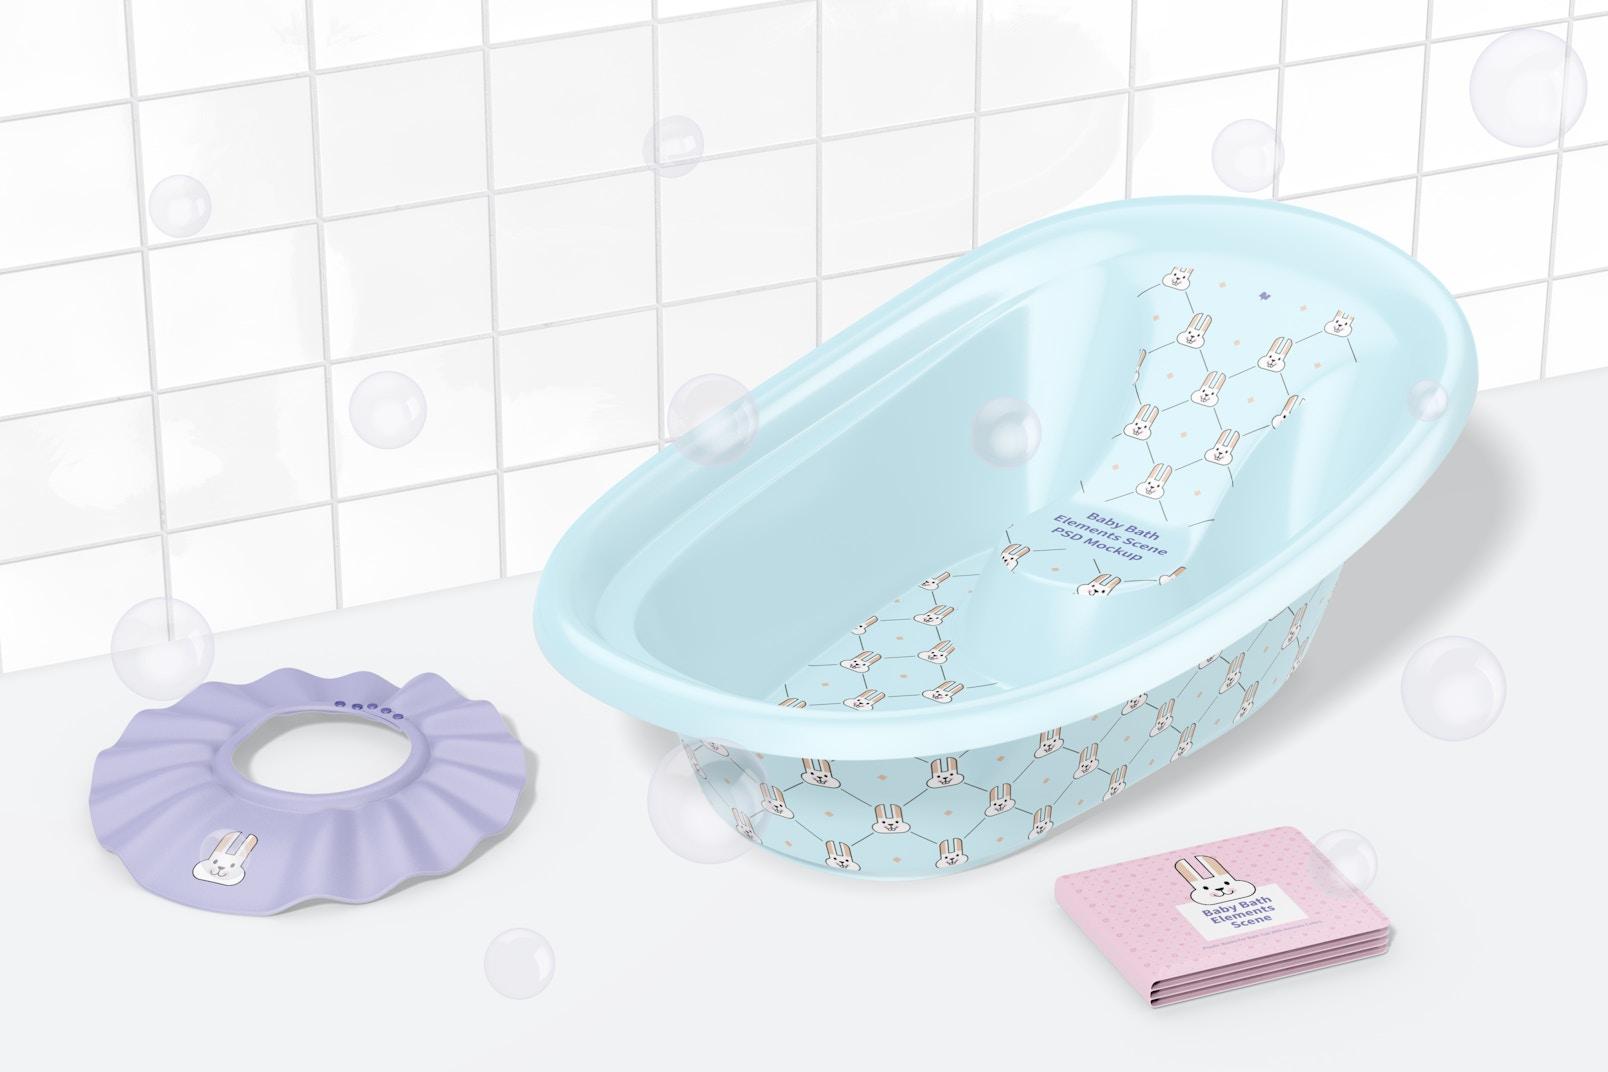 Baby Bath Elements Scene Mockup, Right View